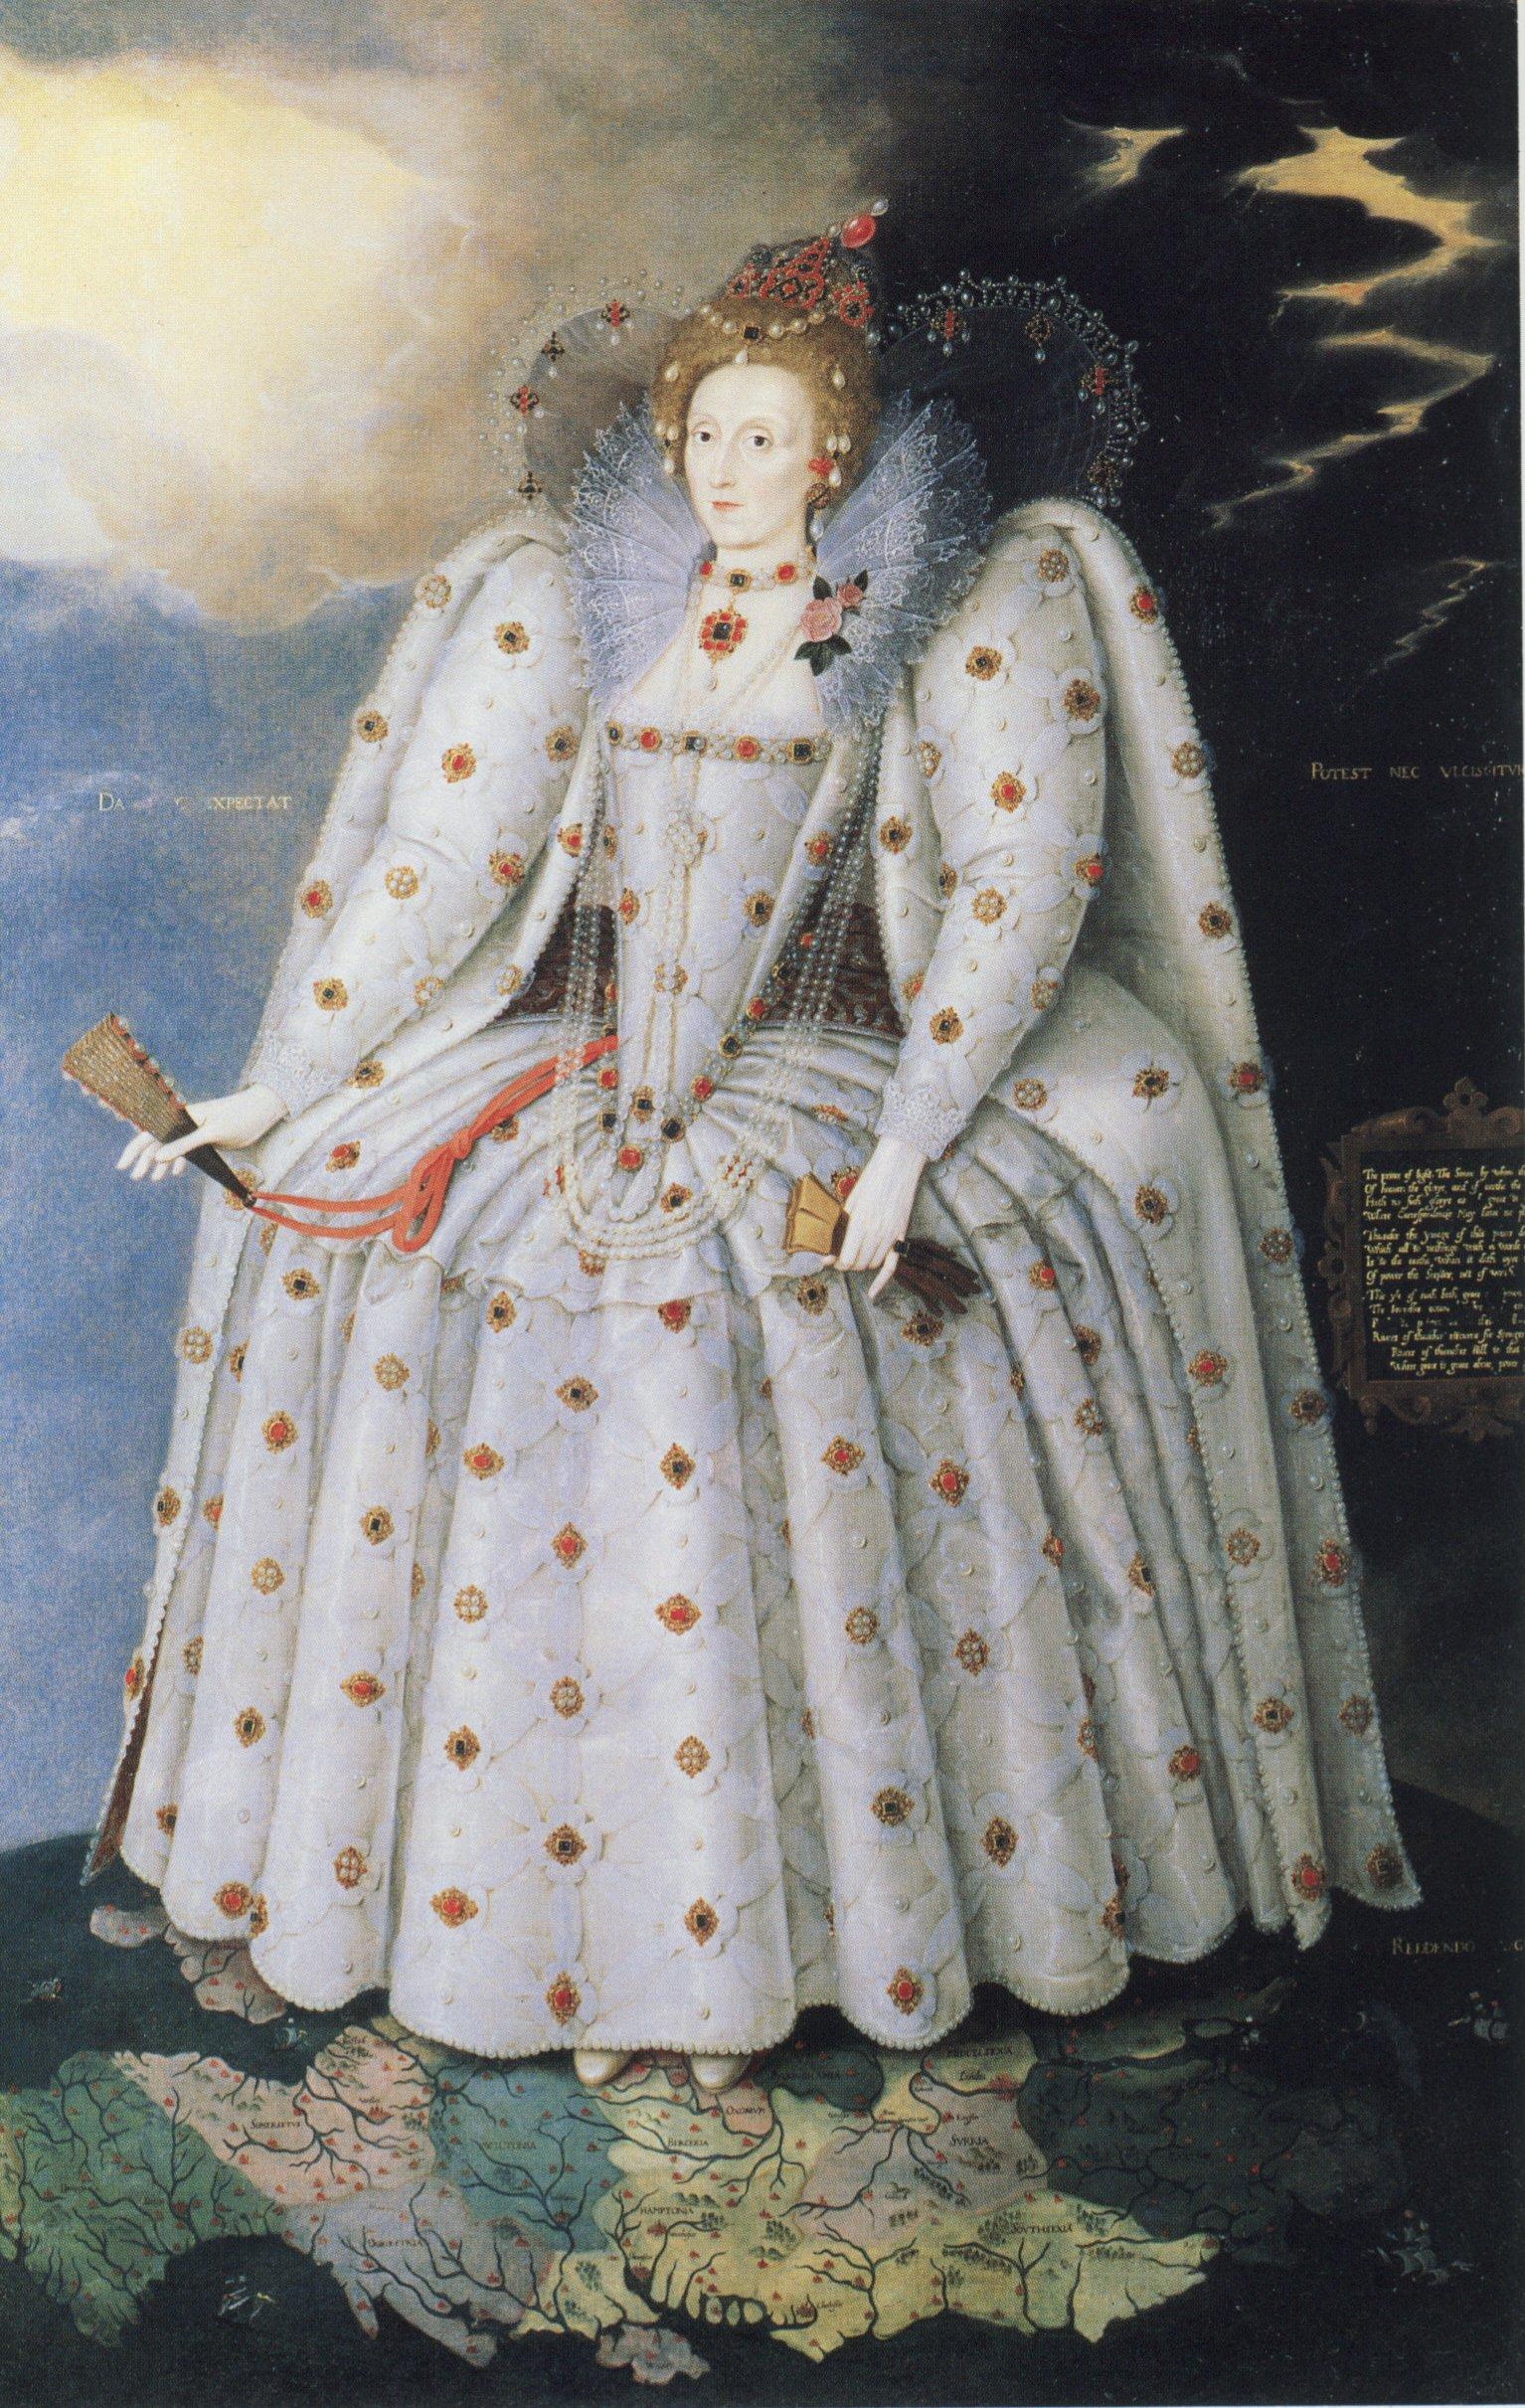 Marcus Gheeraerts Elizabeth I The Ditchley Portrait c1592